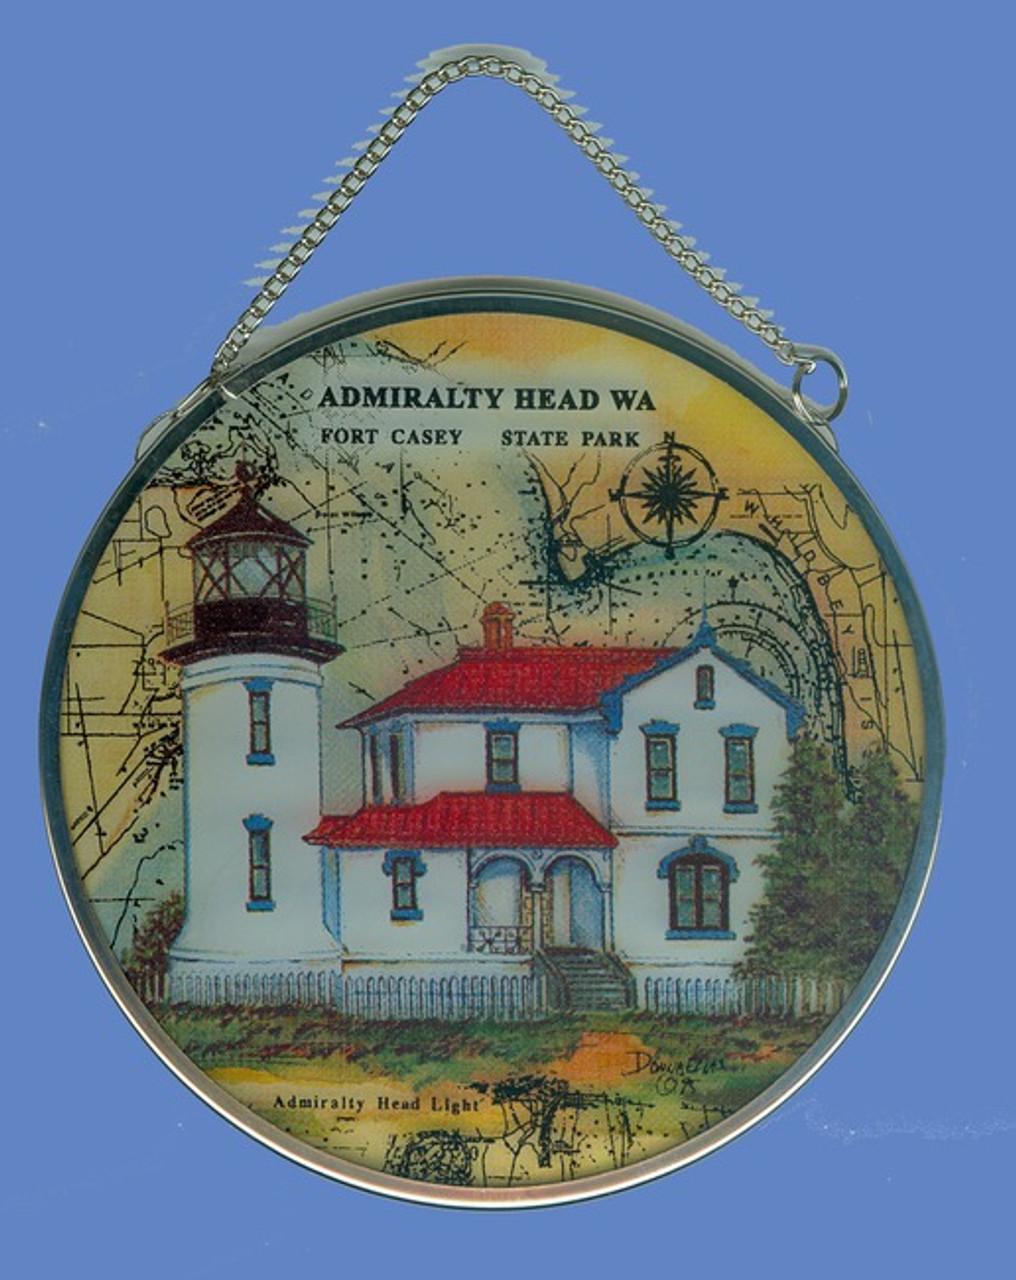 Admiralty Head Lighthouse Suncatcher